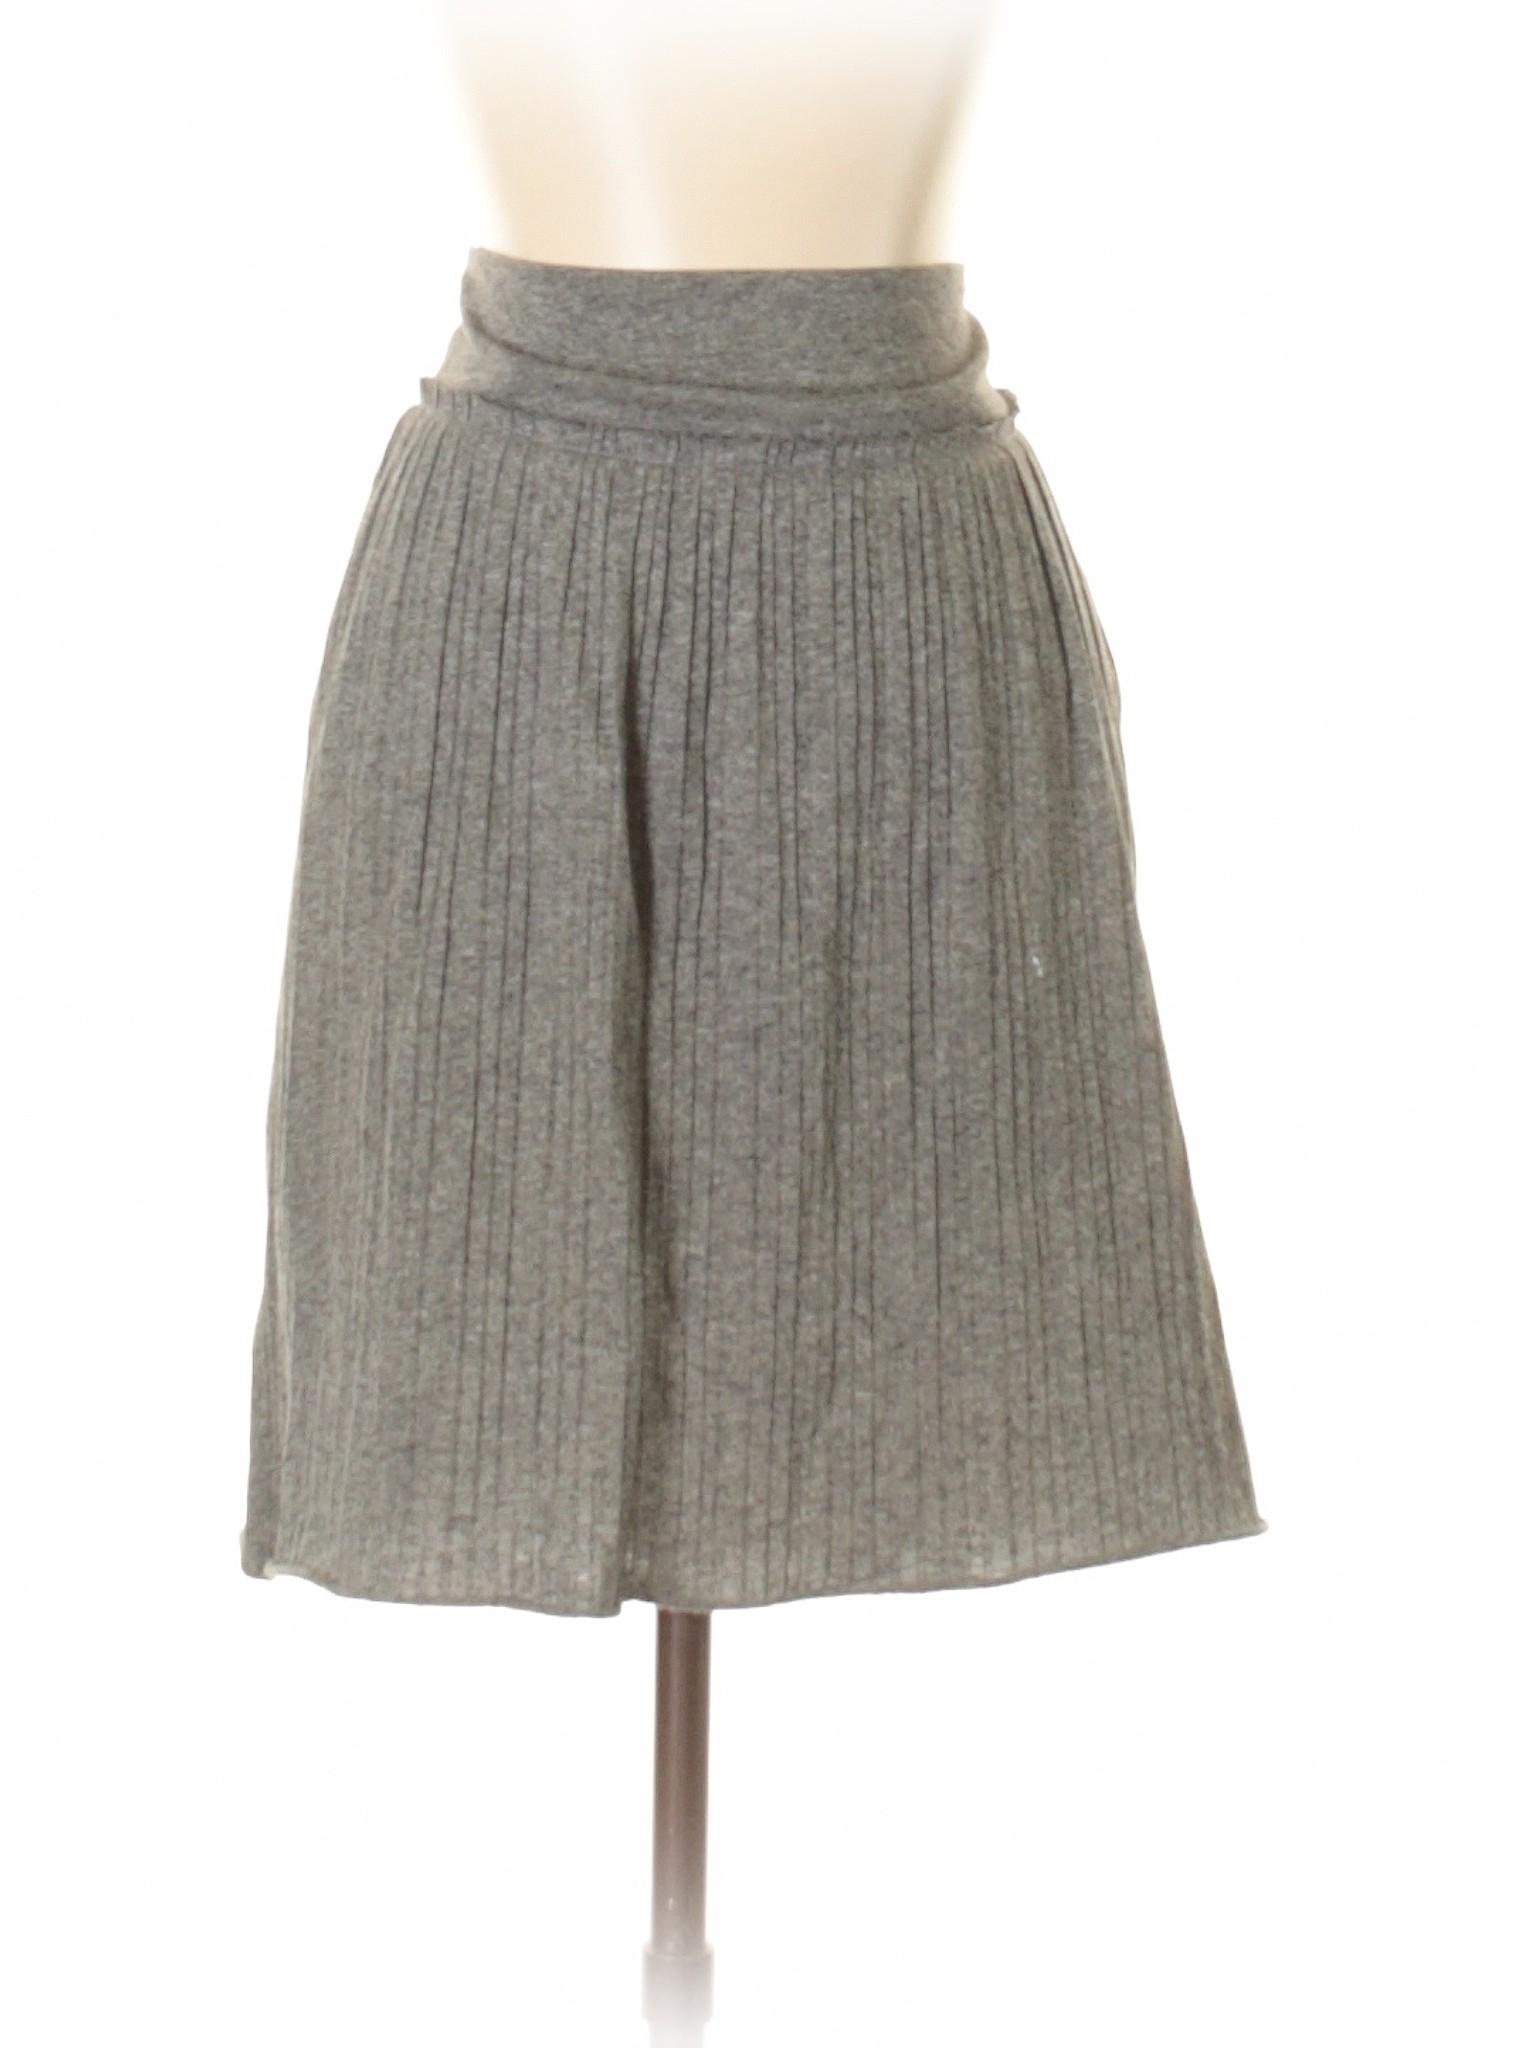 Casual Banana Republic Boutique Skirt leisure tvwZ6wq75